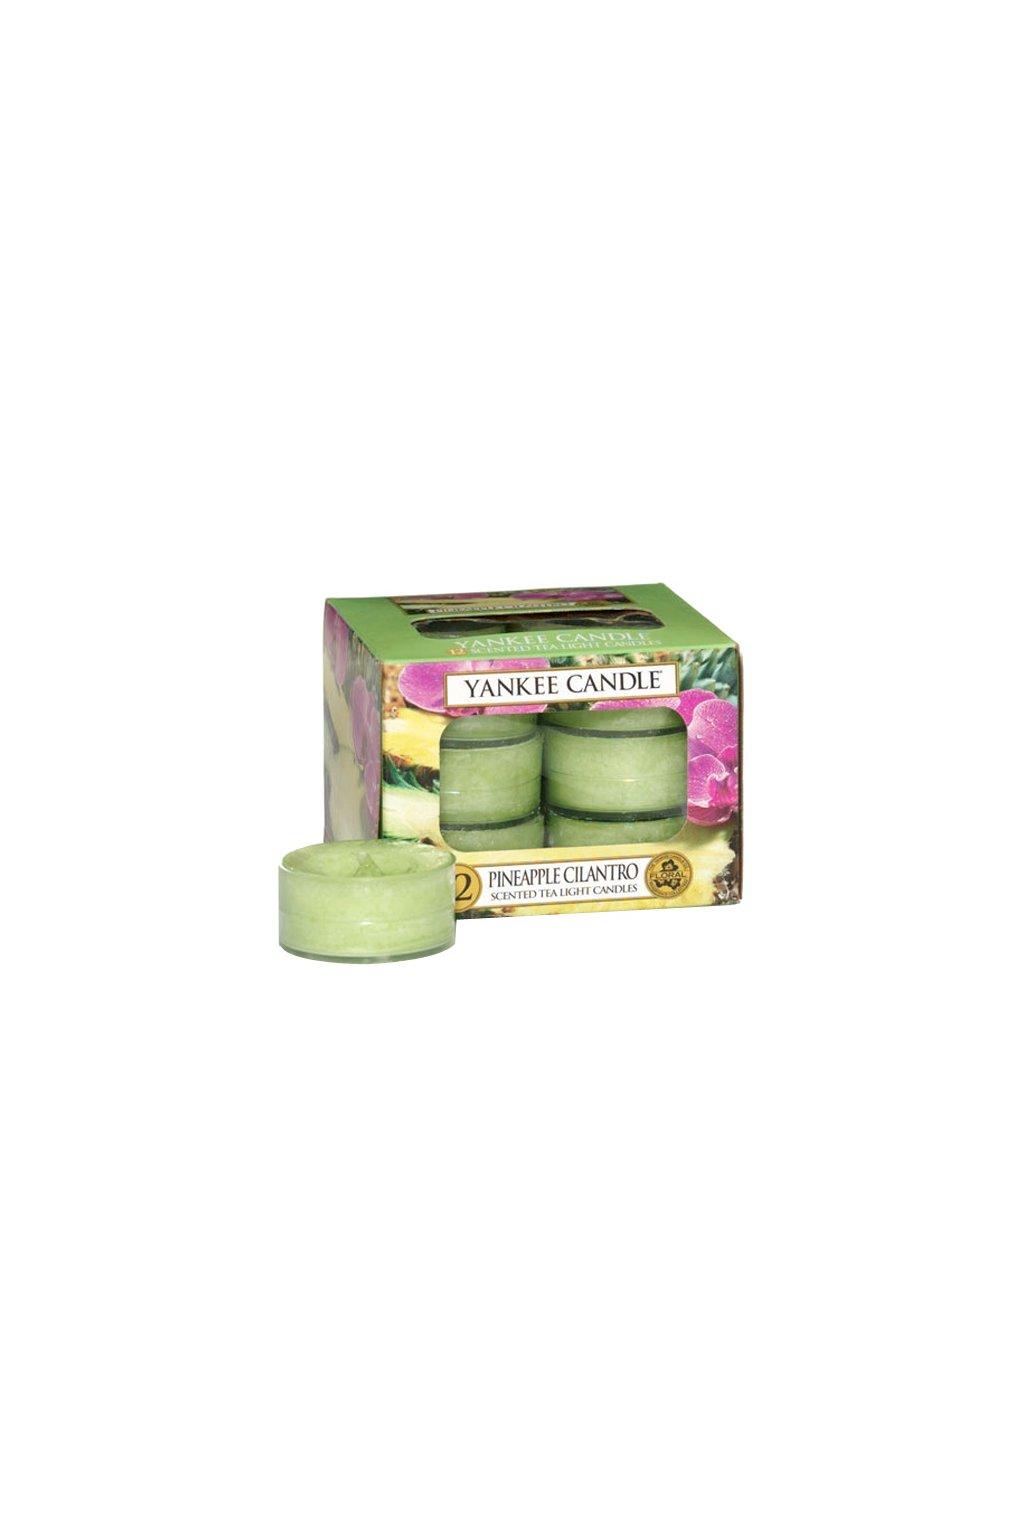 Yankee Candle  Pineapple Cilantro Tea Light